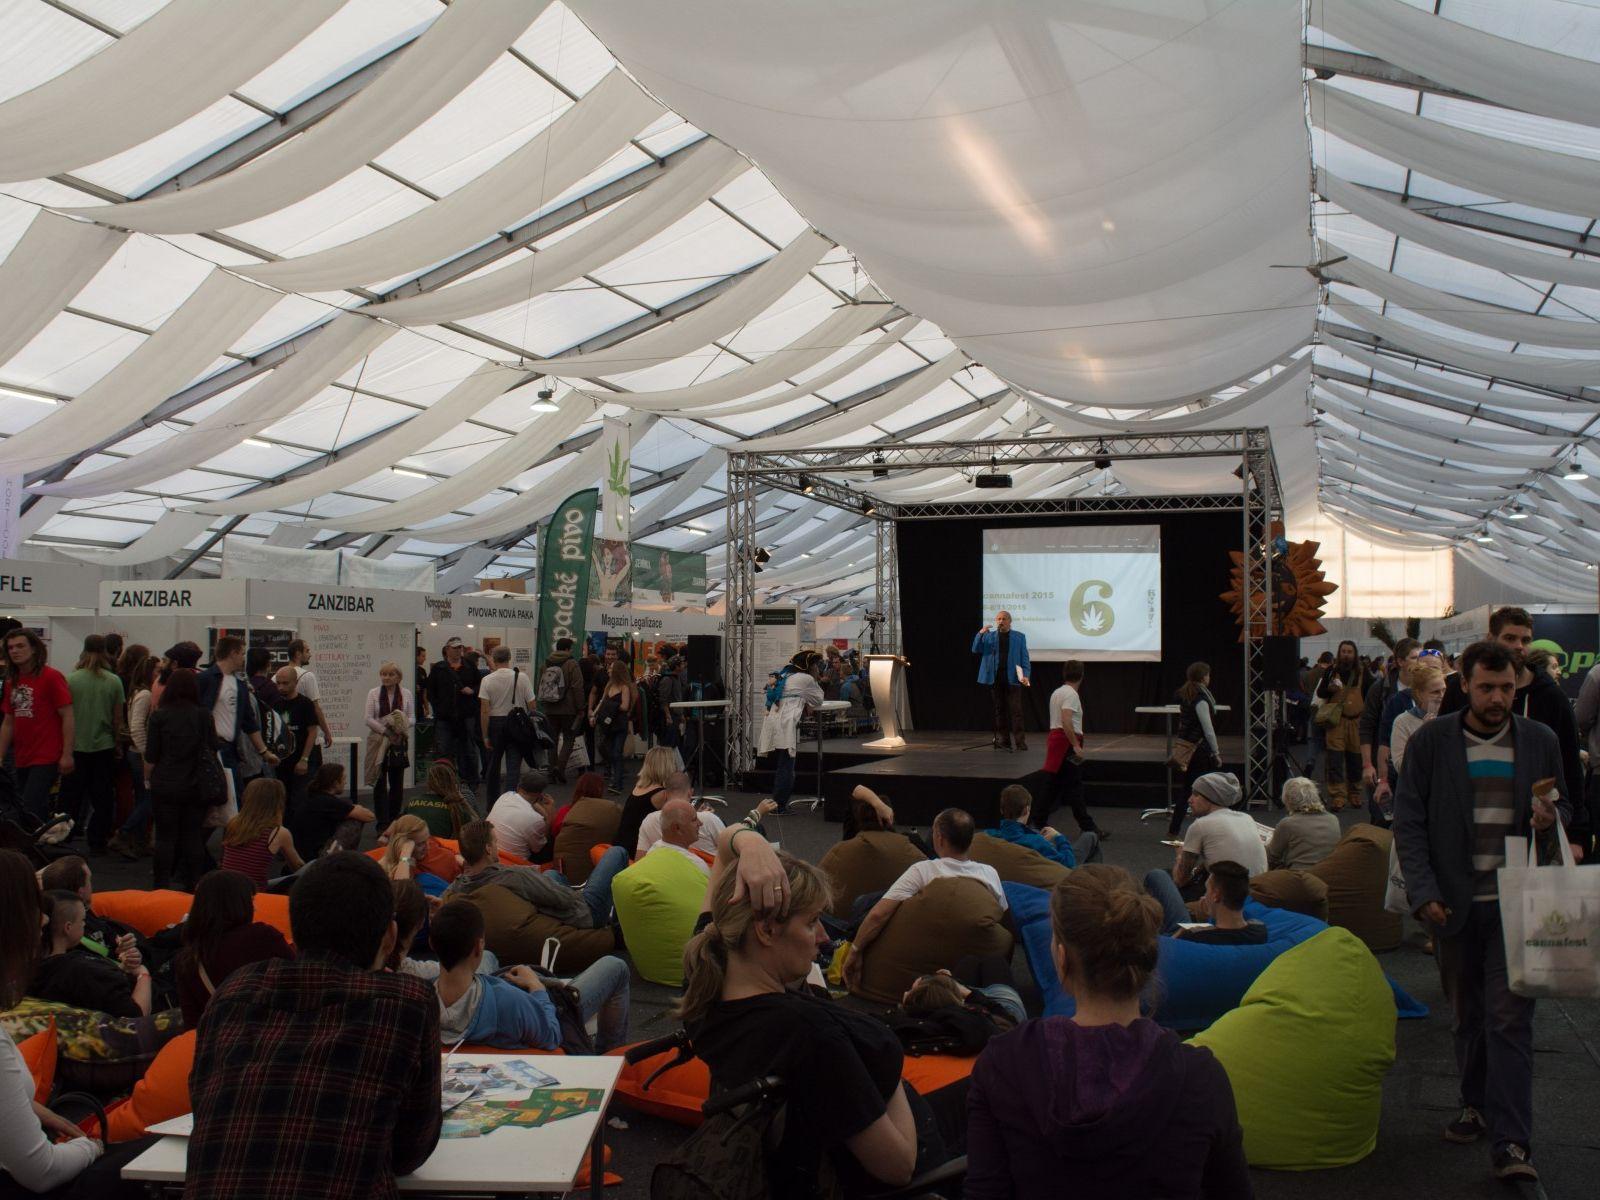 Putovanje Cannafest Prag 2019. - Rasprodano!: Znanstvene tribine, edukacija i predavanja